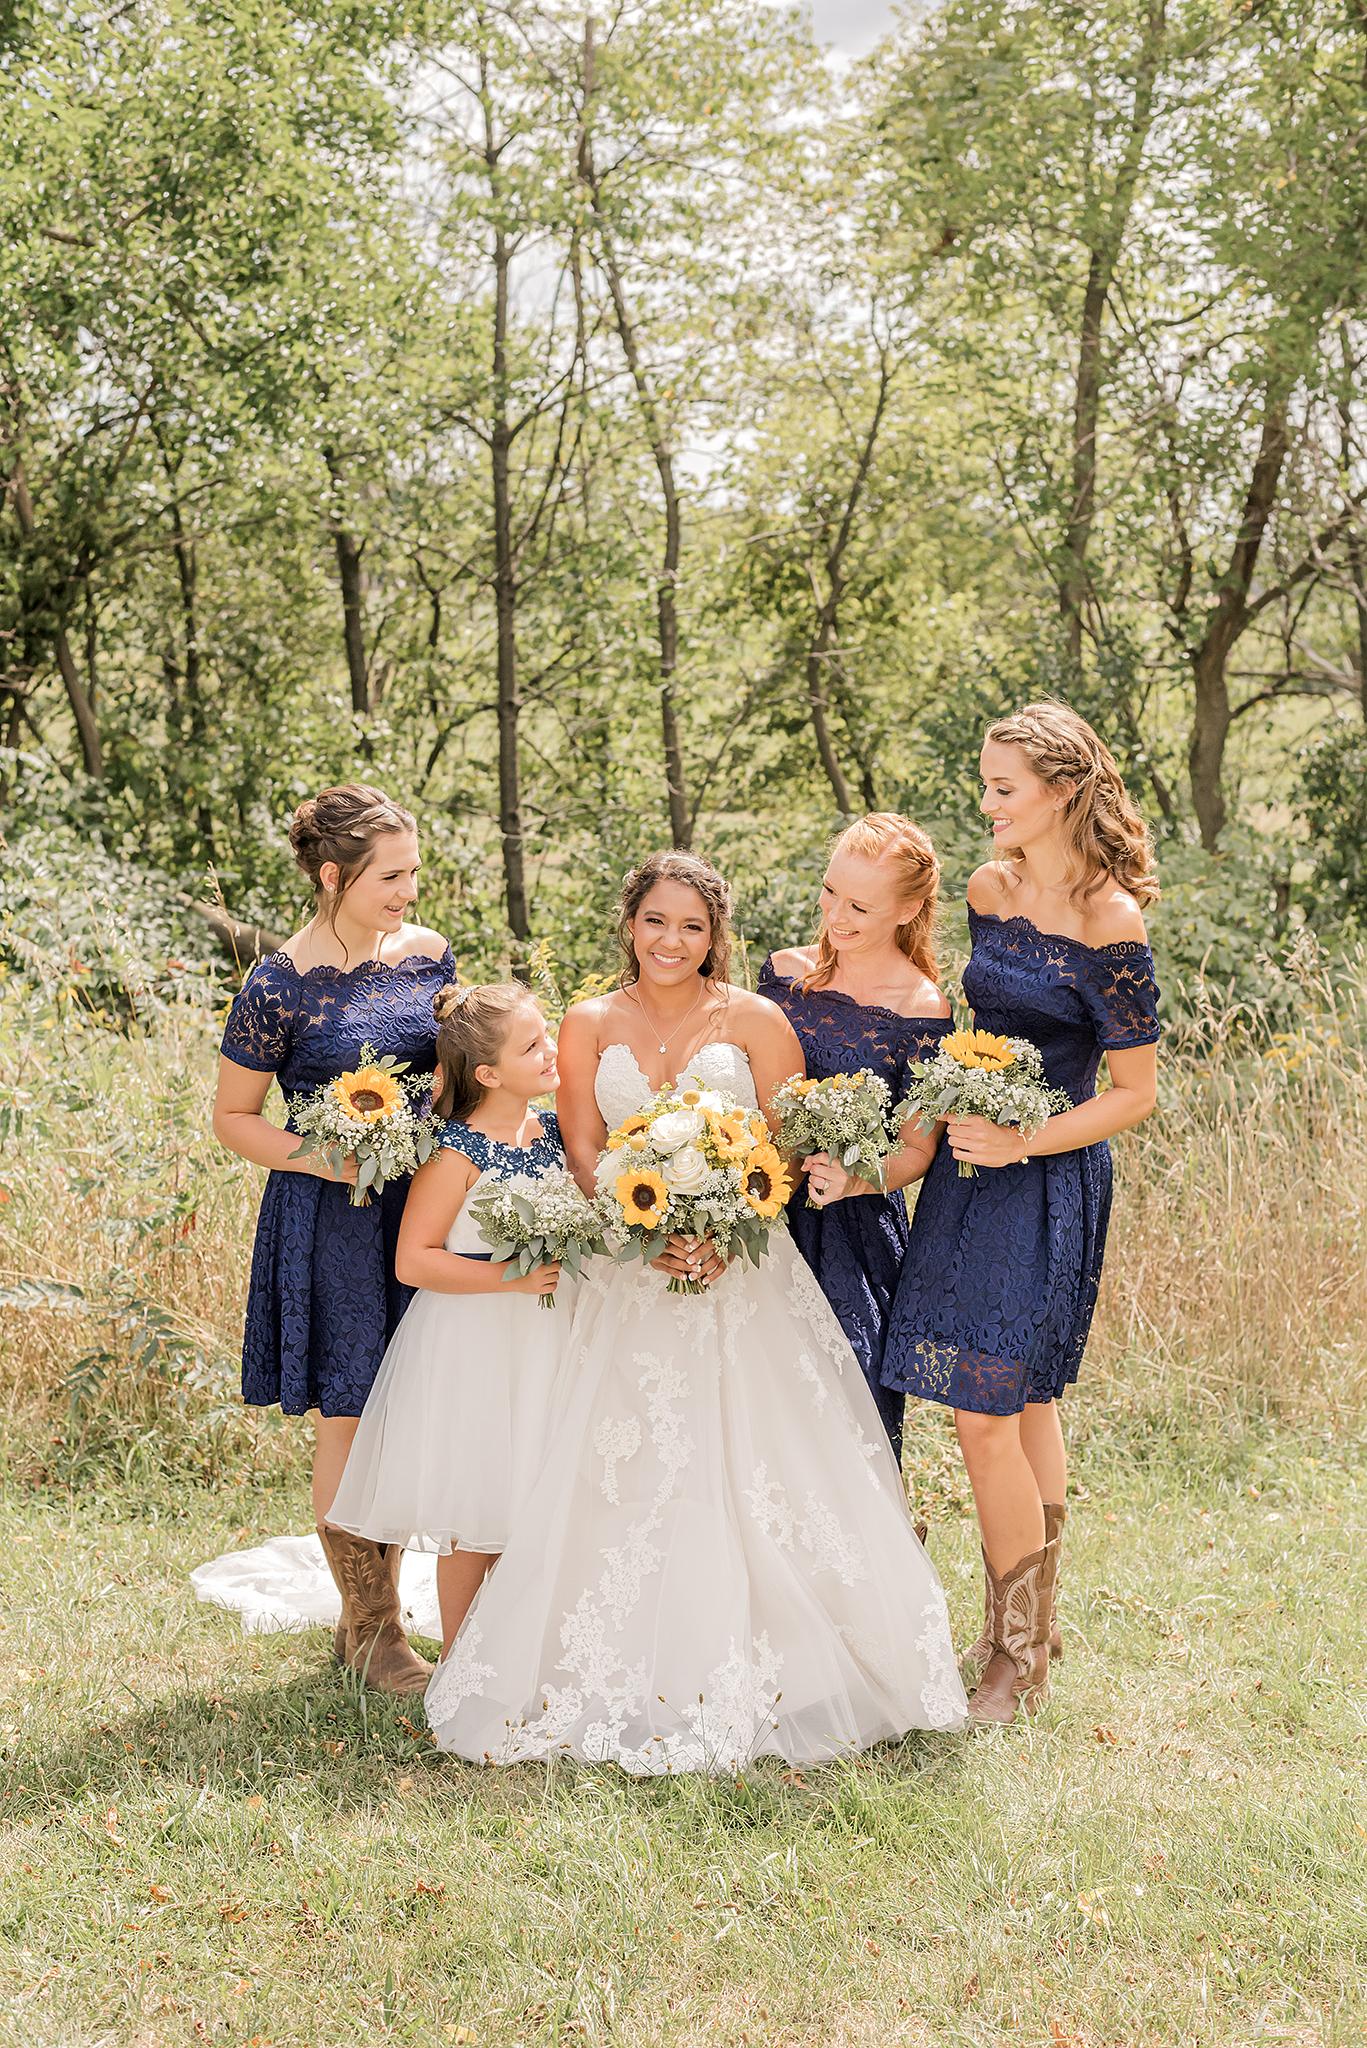 Lindsay-Adkins-Photography-Michigan-Wedding-Photographer-Miller-14